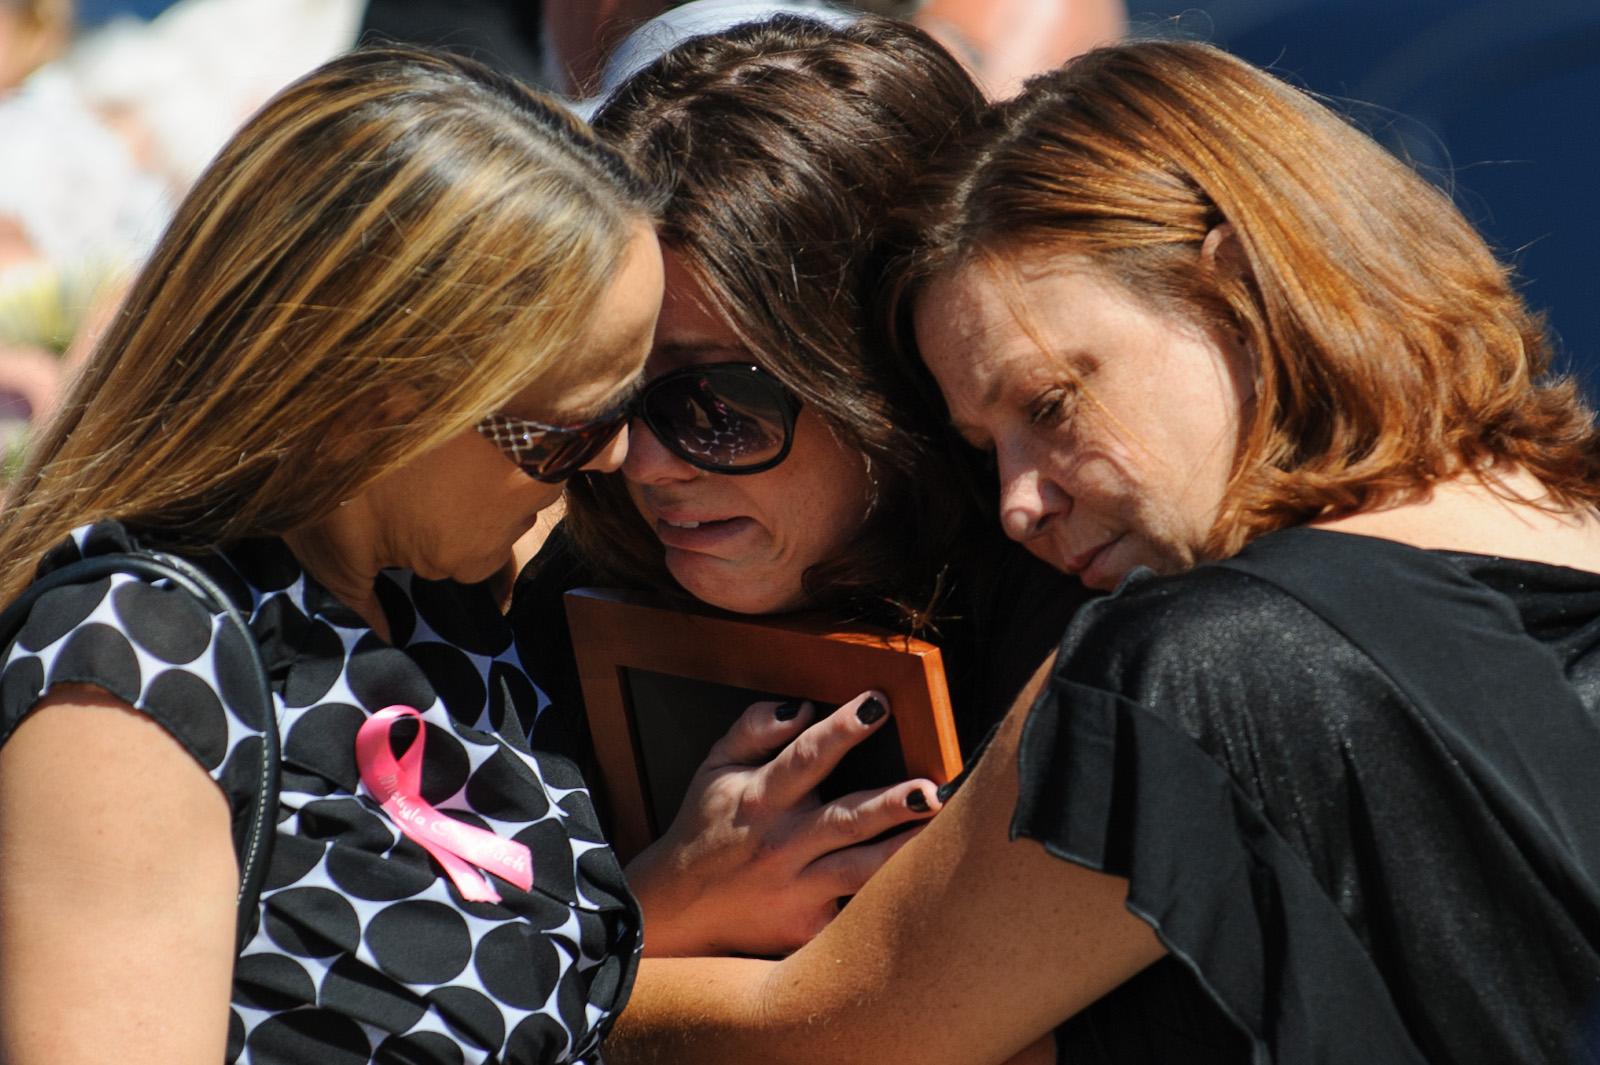 Aurora shooting rampage victim Micayla Medek funeralRead more: